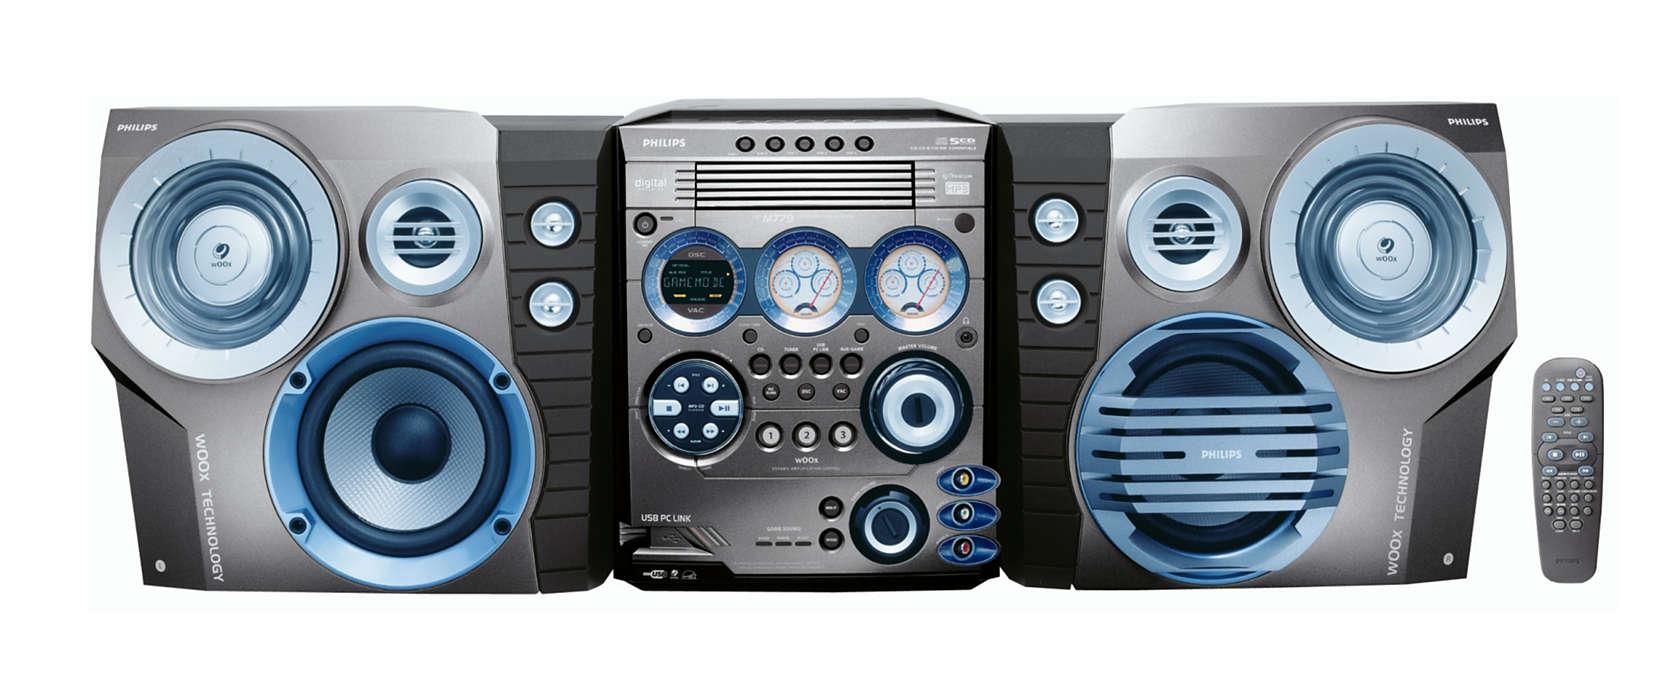 Controla a distancia la música MP3 del PC